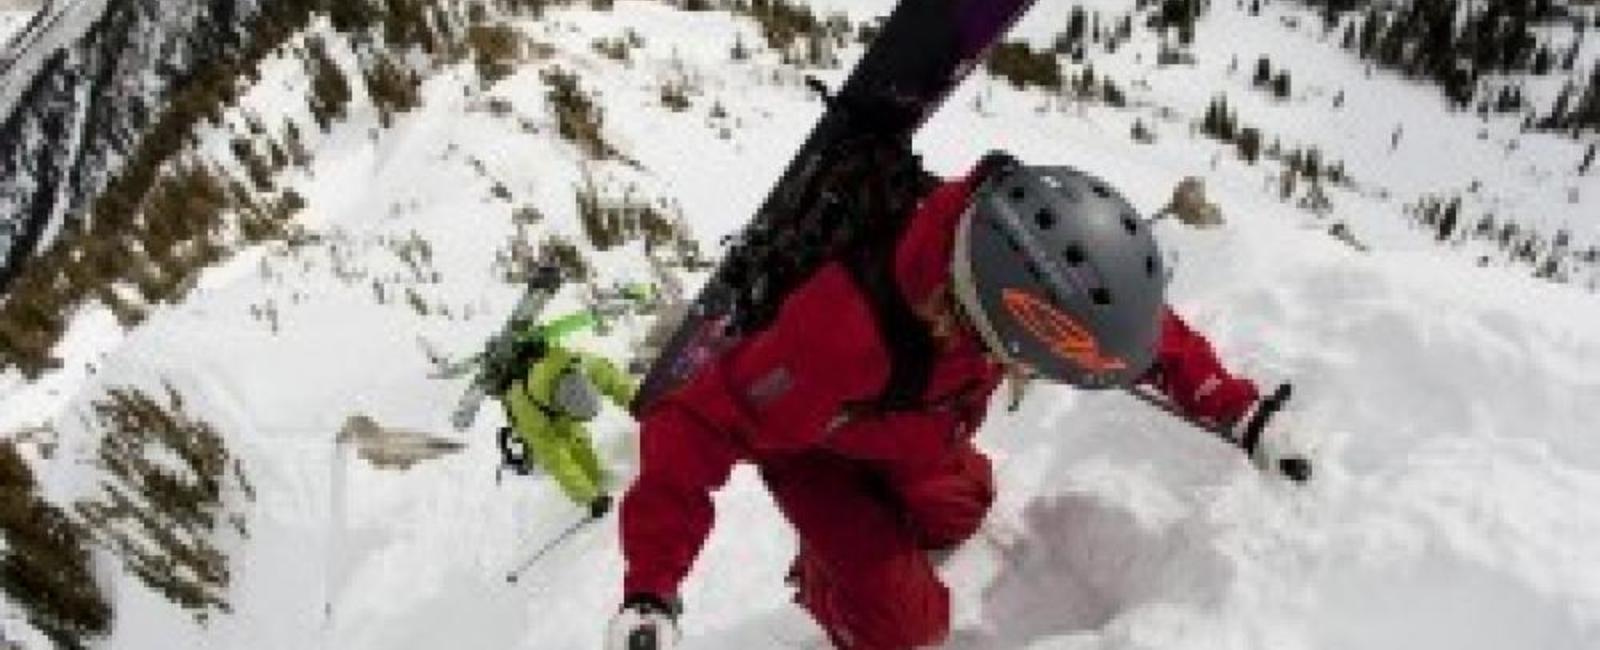 Learn a Snow Sport Month - Powder Mountain